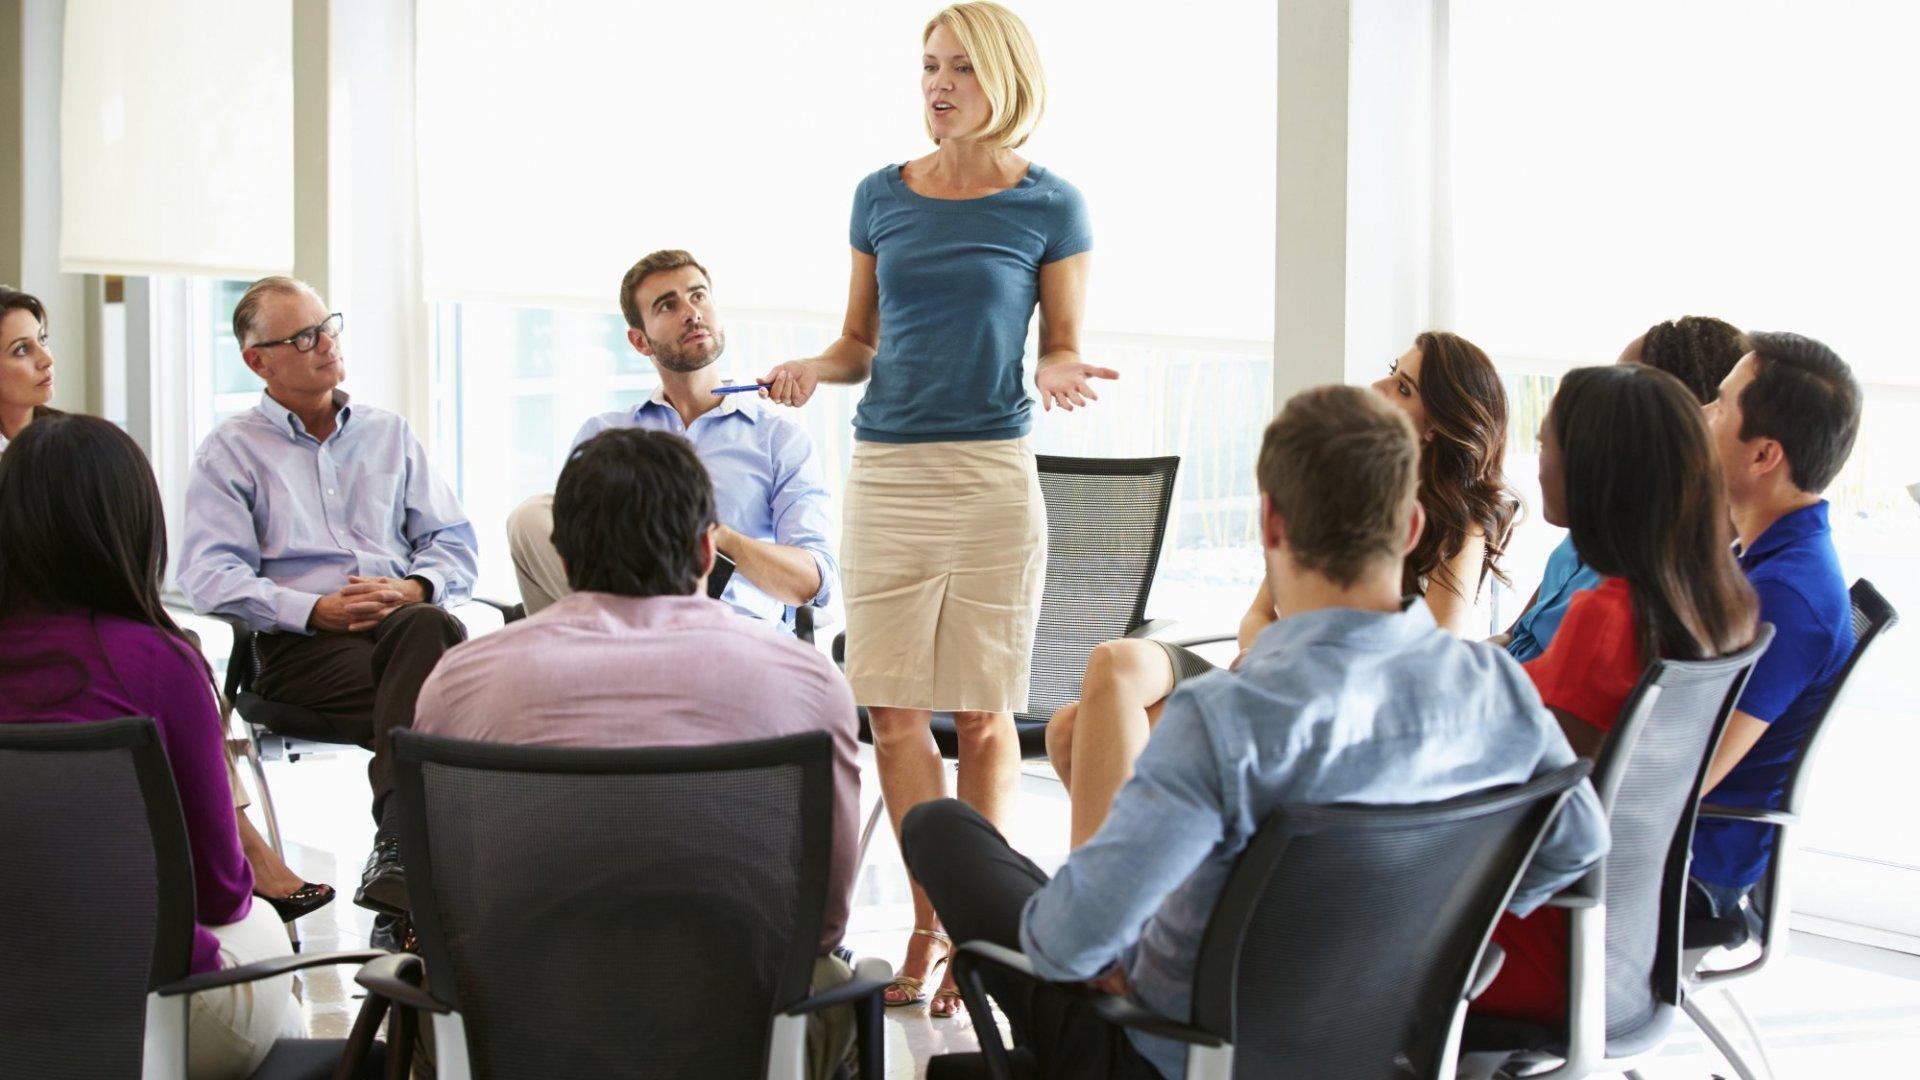 3 Proven Ways Genuine Leaders Build Trust